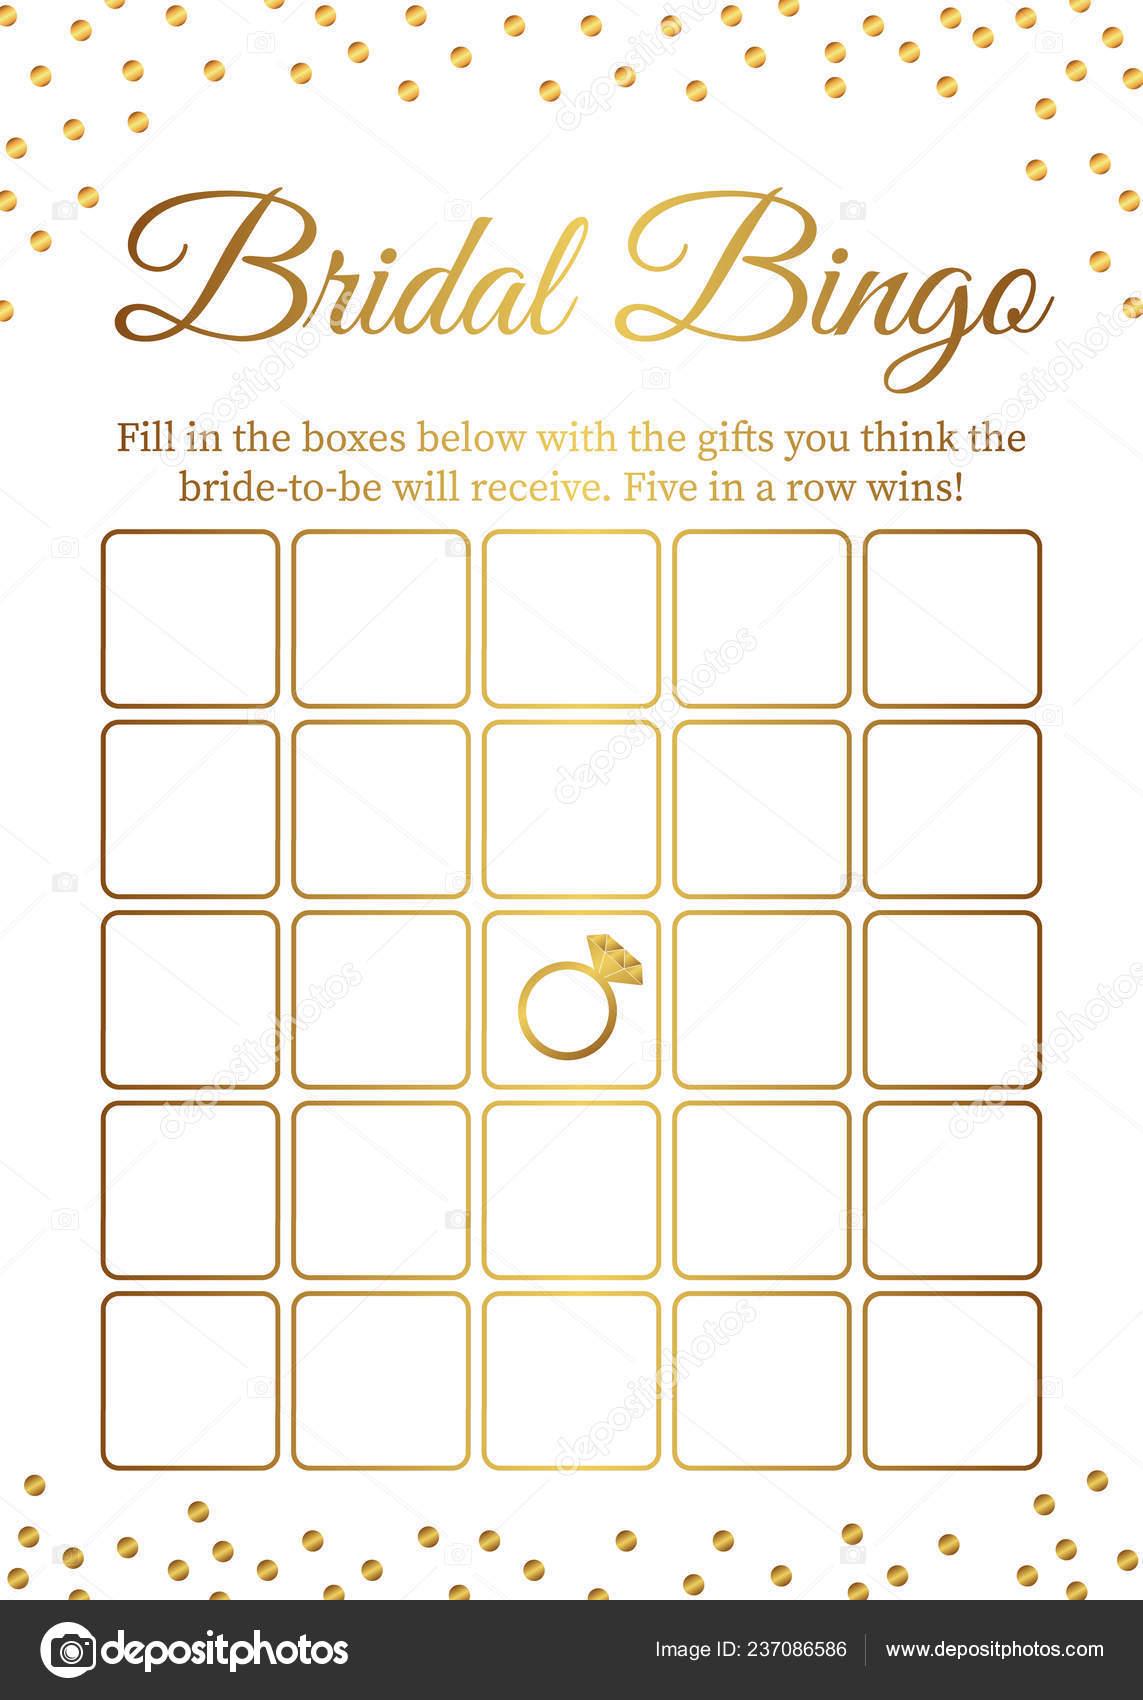 Bridal Bingo Card Template Bridal Shower Bingo Games Funny Activity